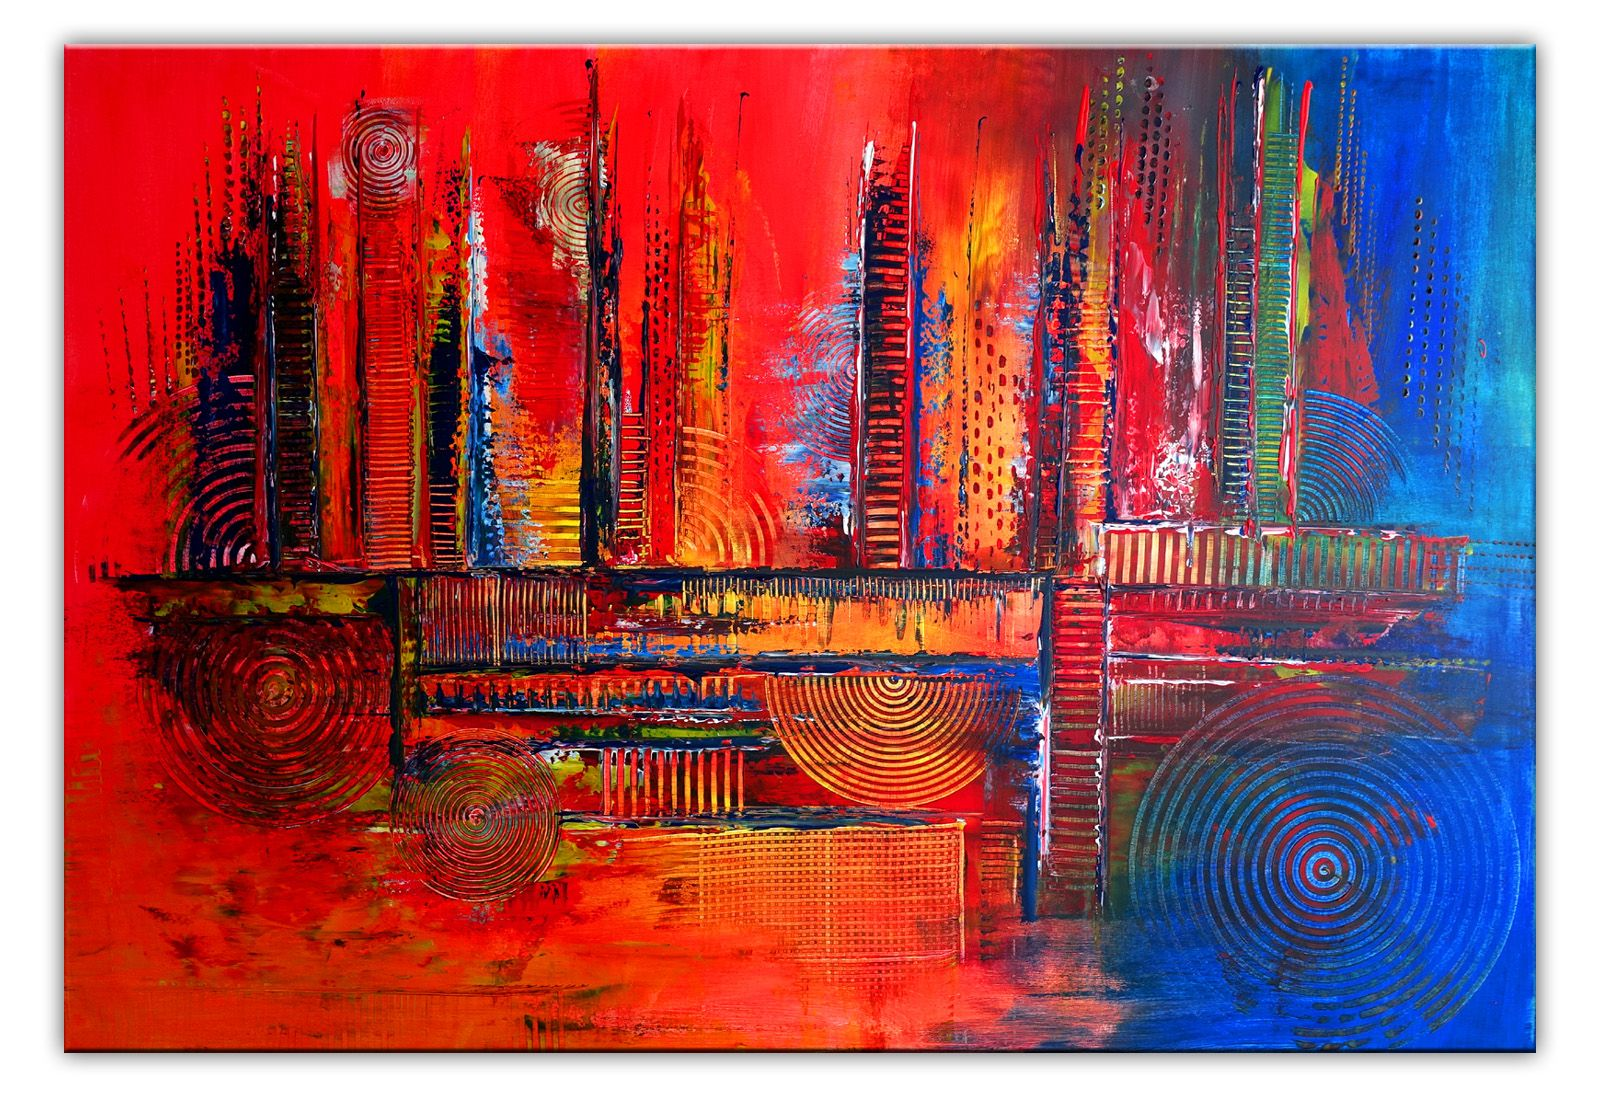 Rote Nova Xxl Abstrakte Malerei Wandbild Rot Blau Bunt Abstrakte Malerei Abstrakt Abstraktes Gemälde